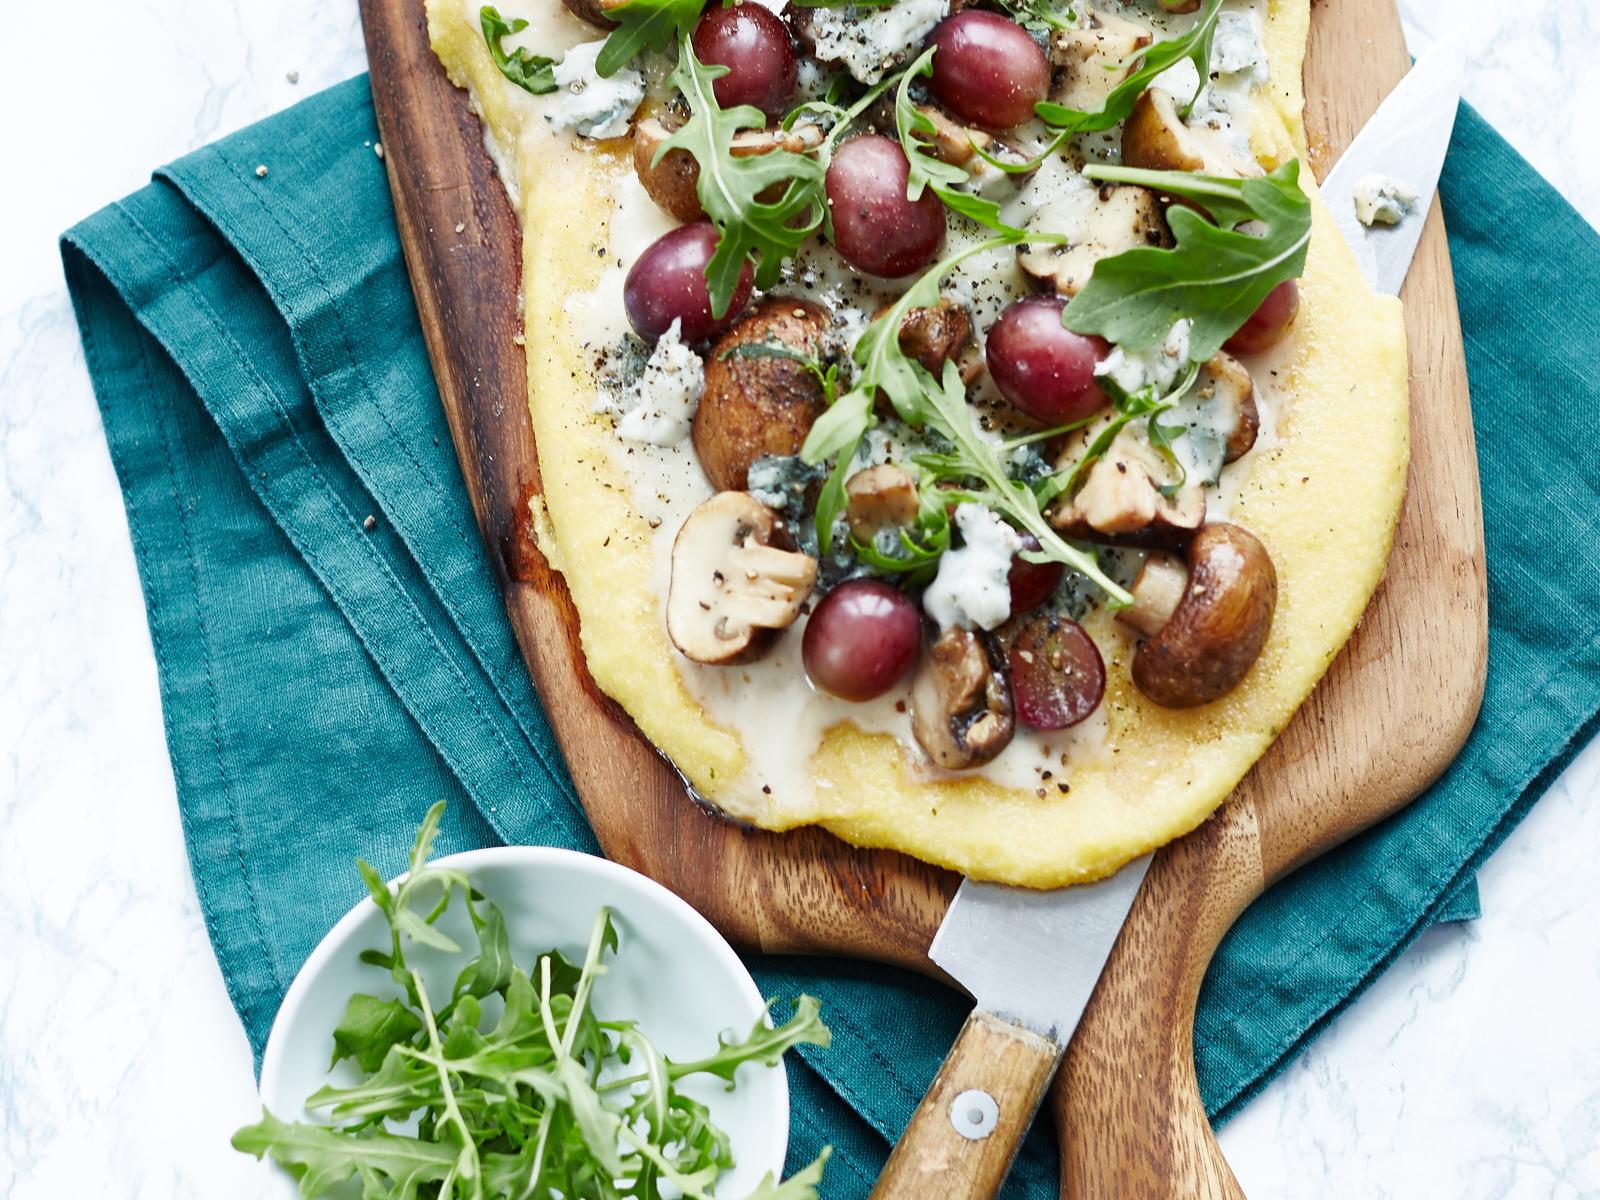 Polentapizza mit Pilzen & Trauben